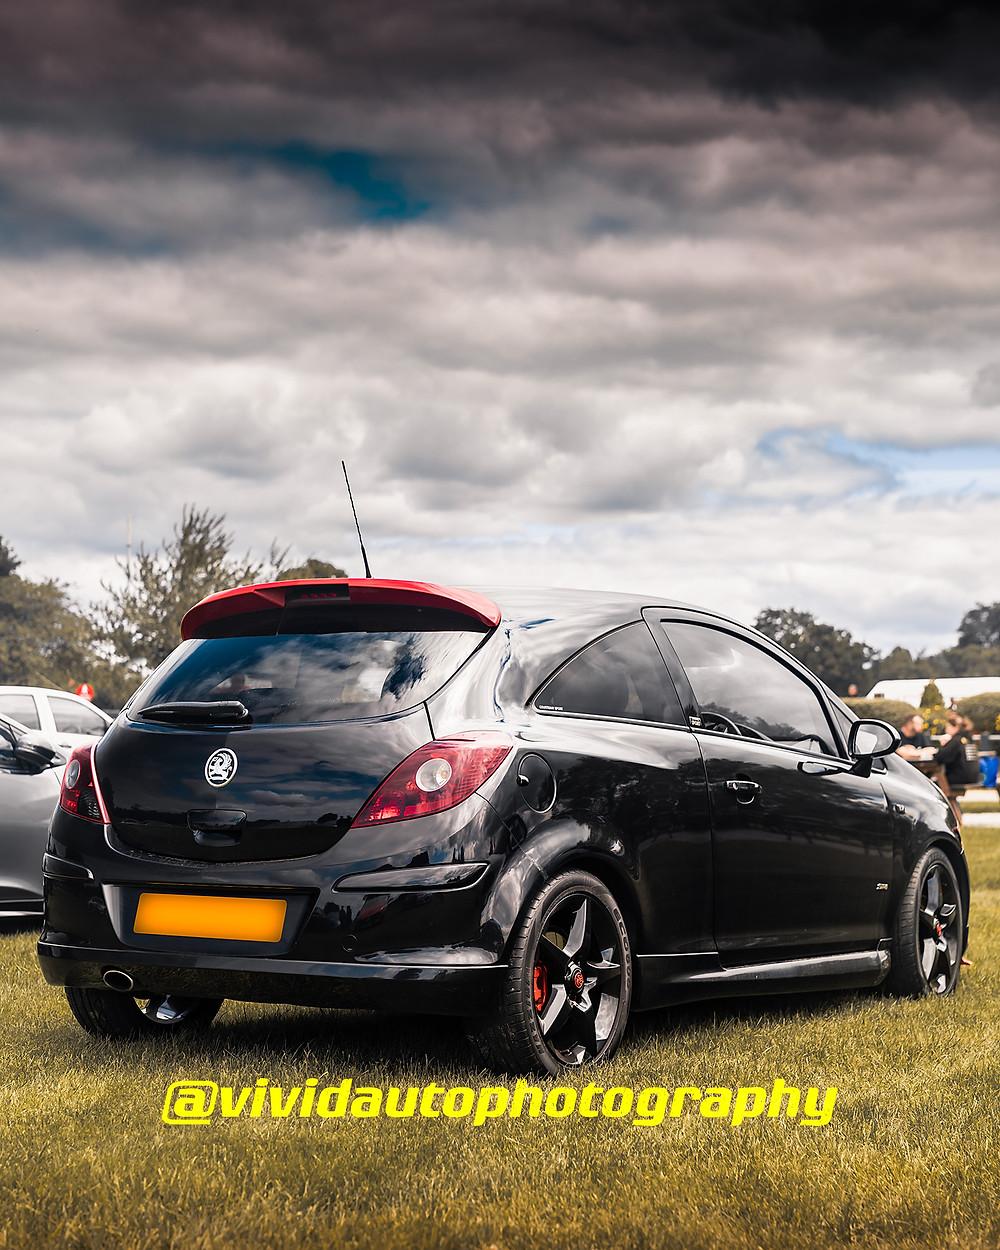 Vauxhall Corsa D | Black | Rear three quarters poster